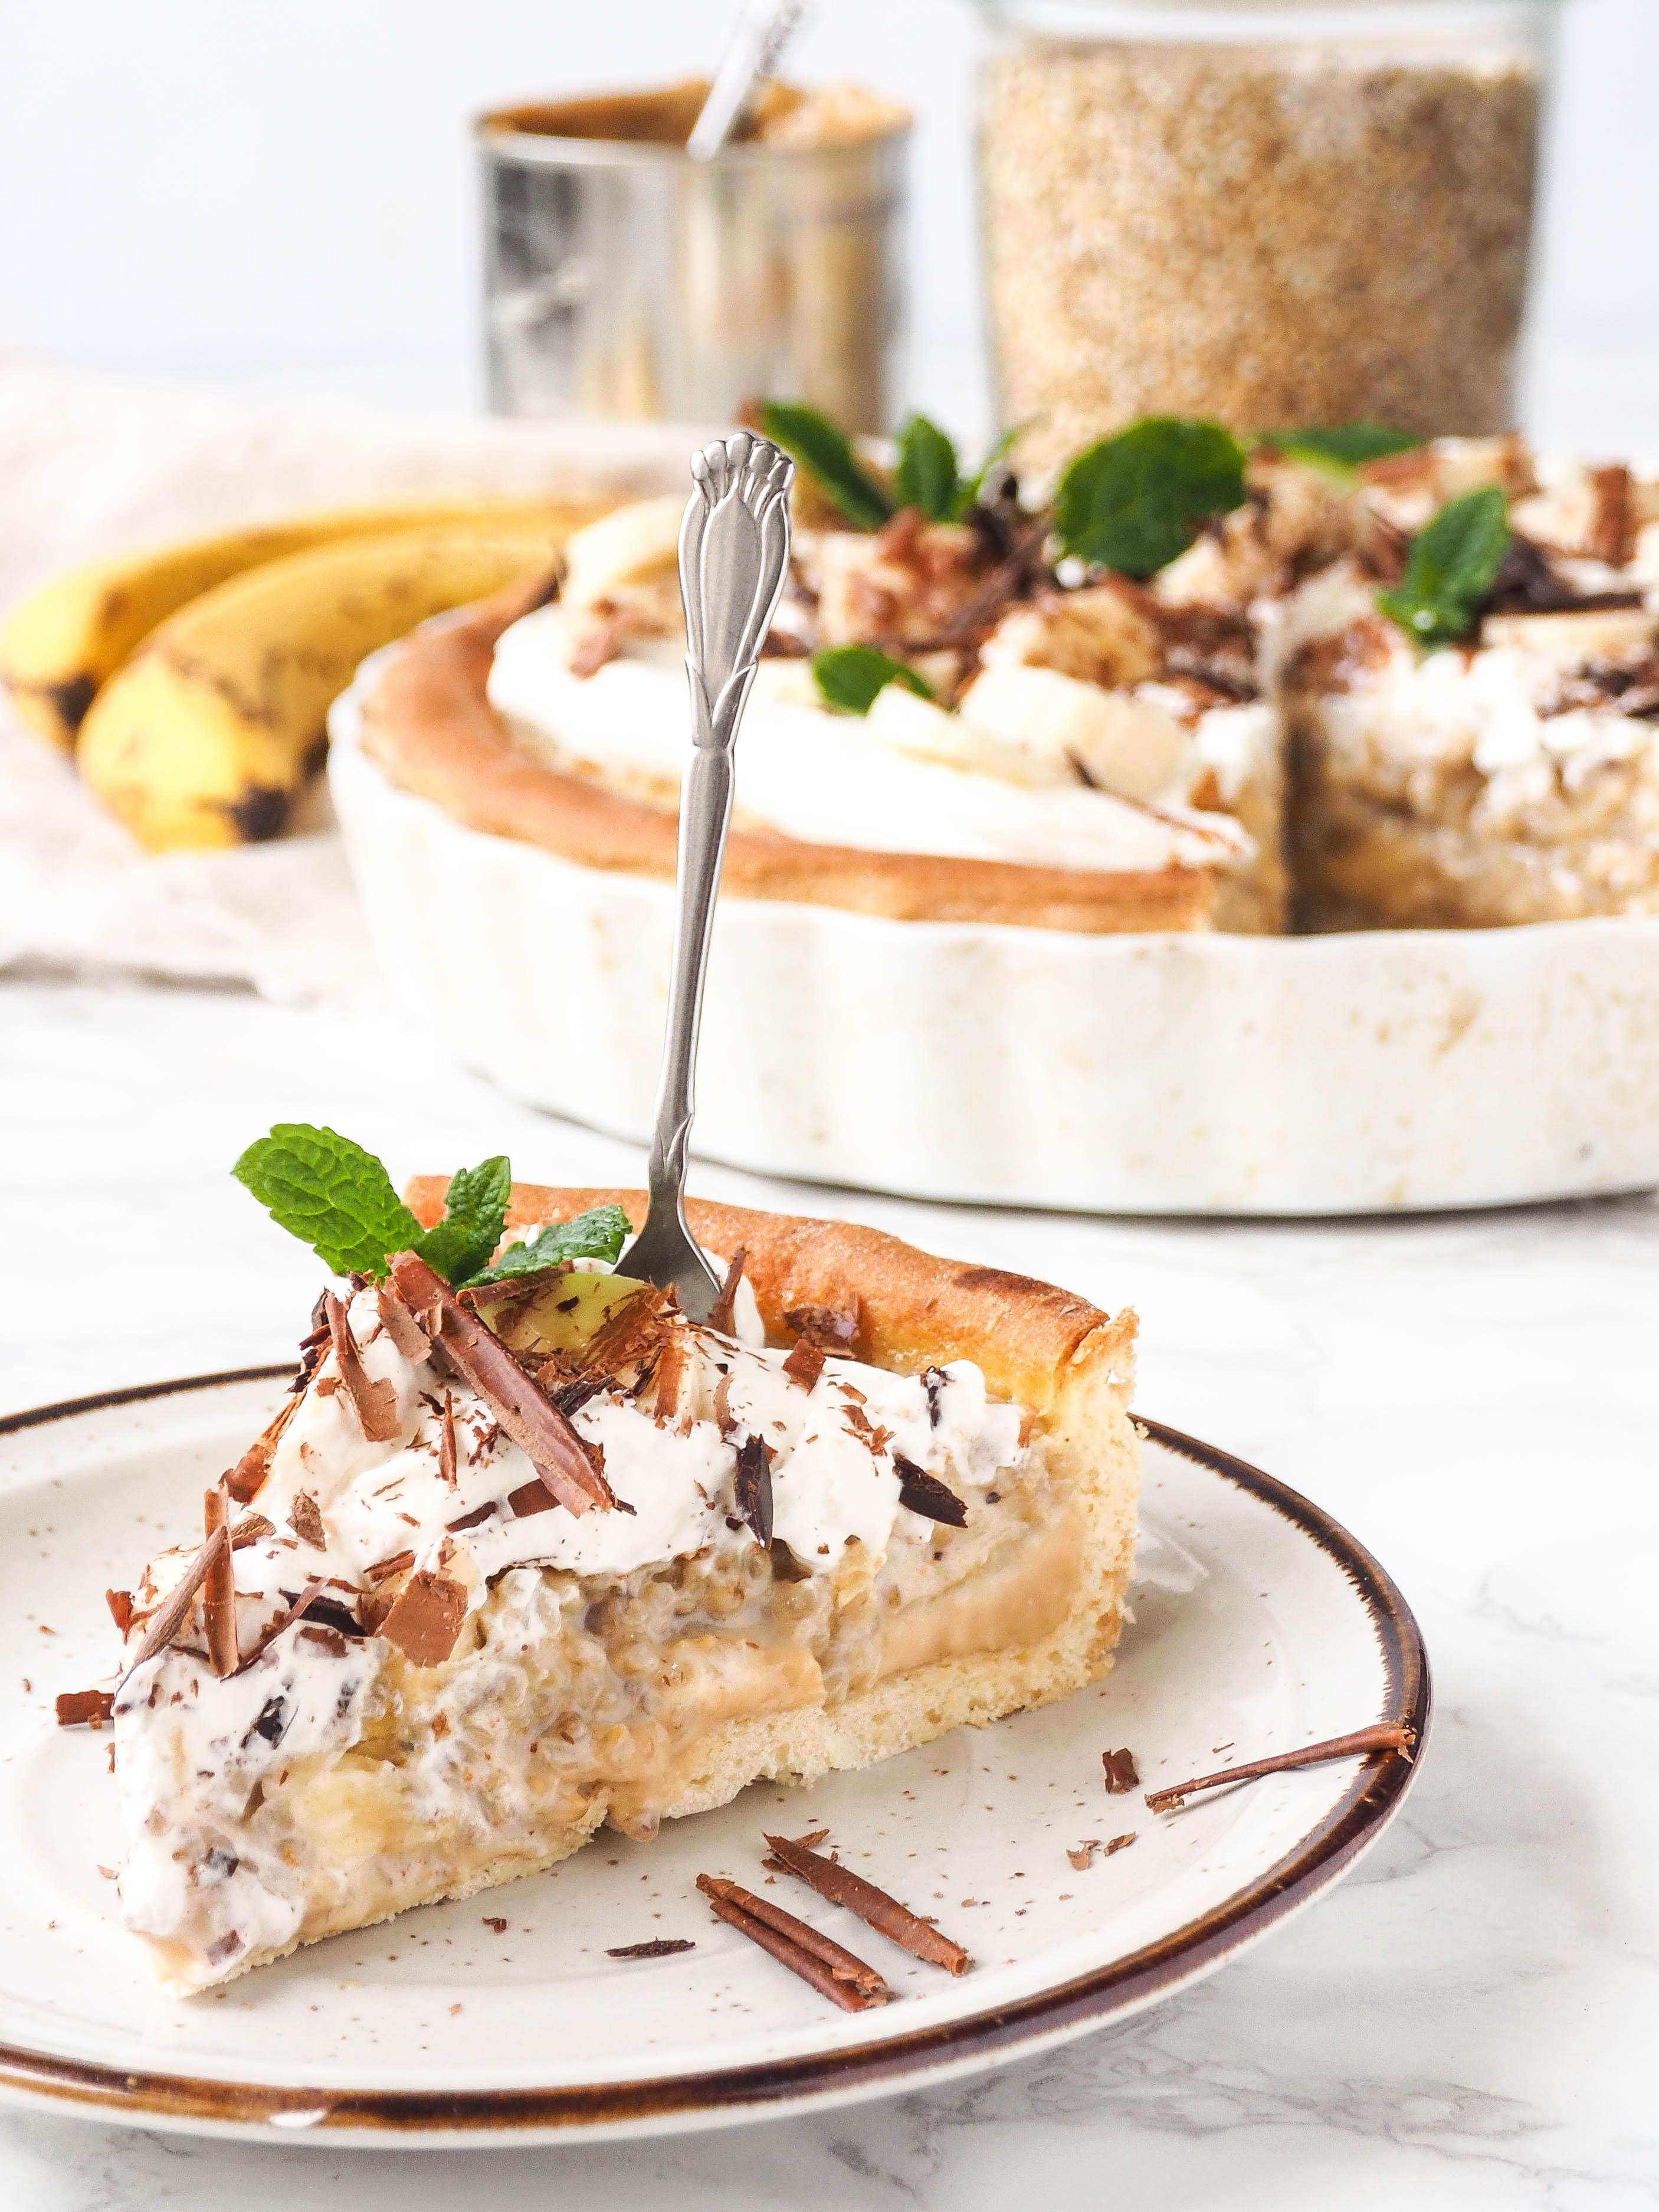 Havergrutten banoffee taart